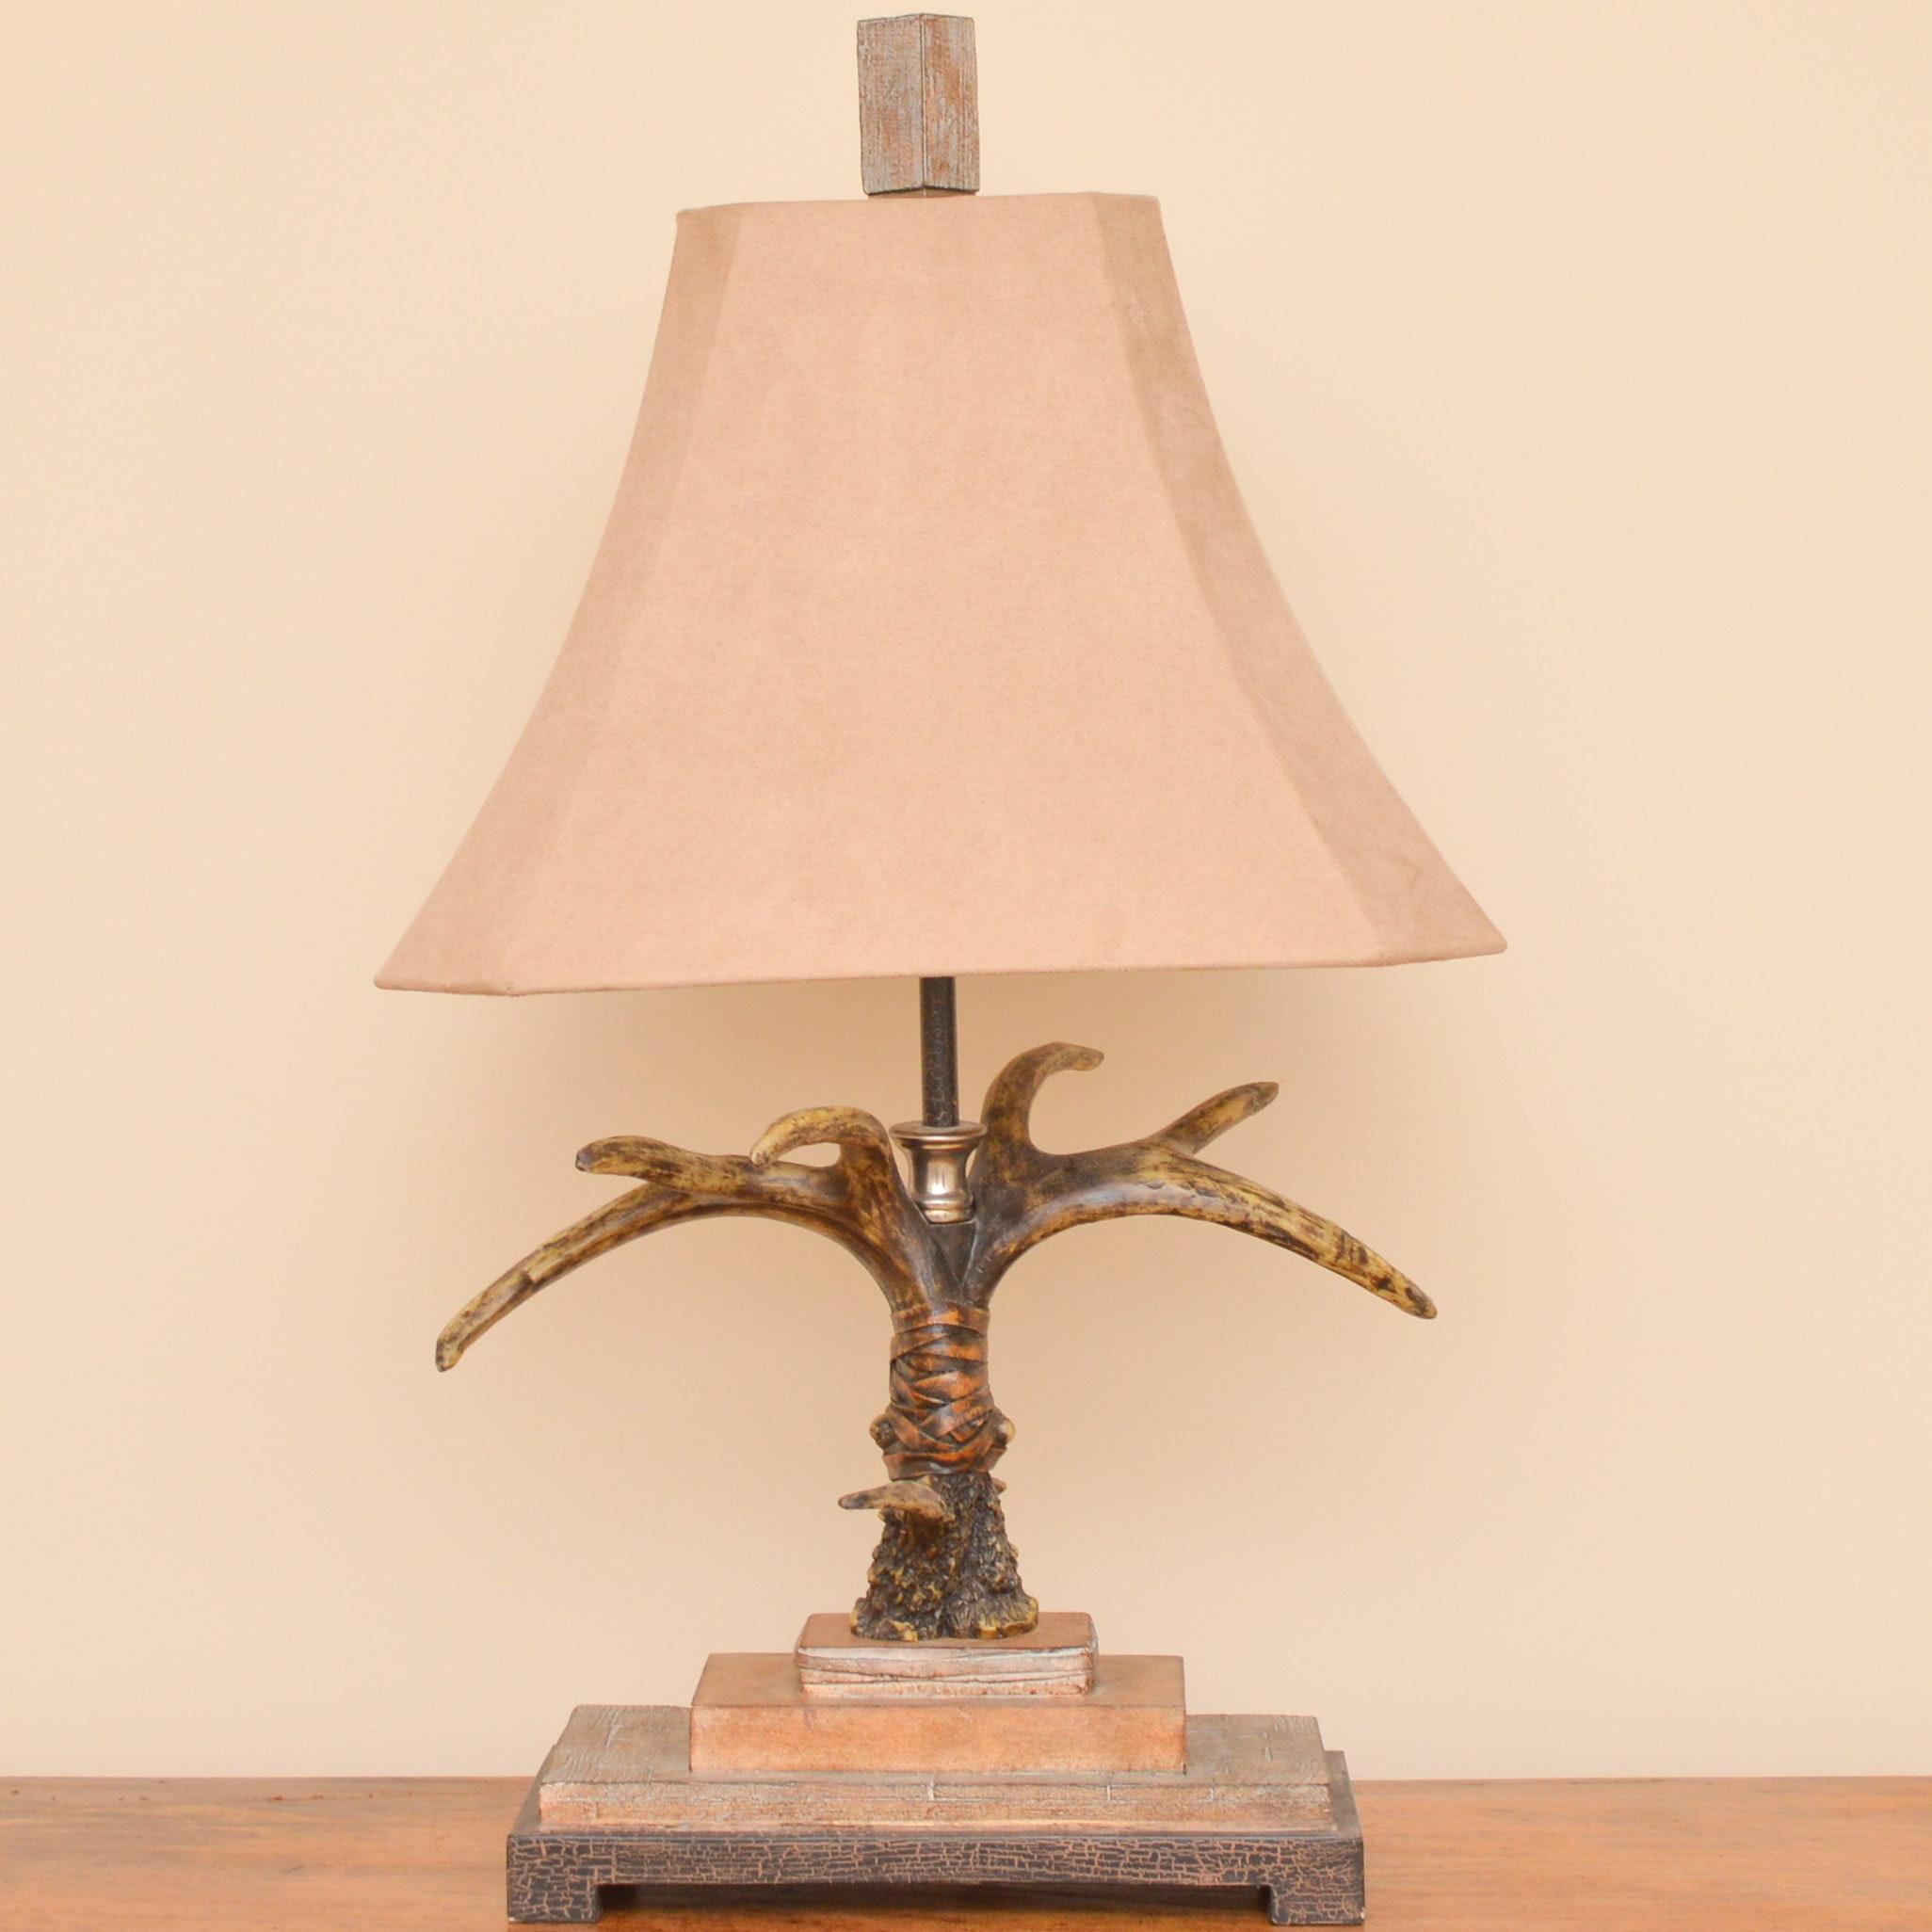 Antler Table Lamp on Resin Base